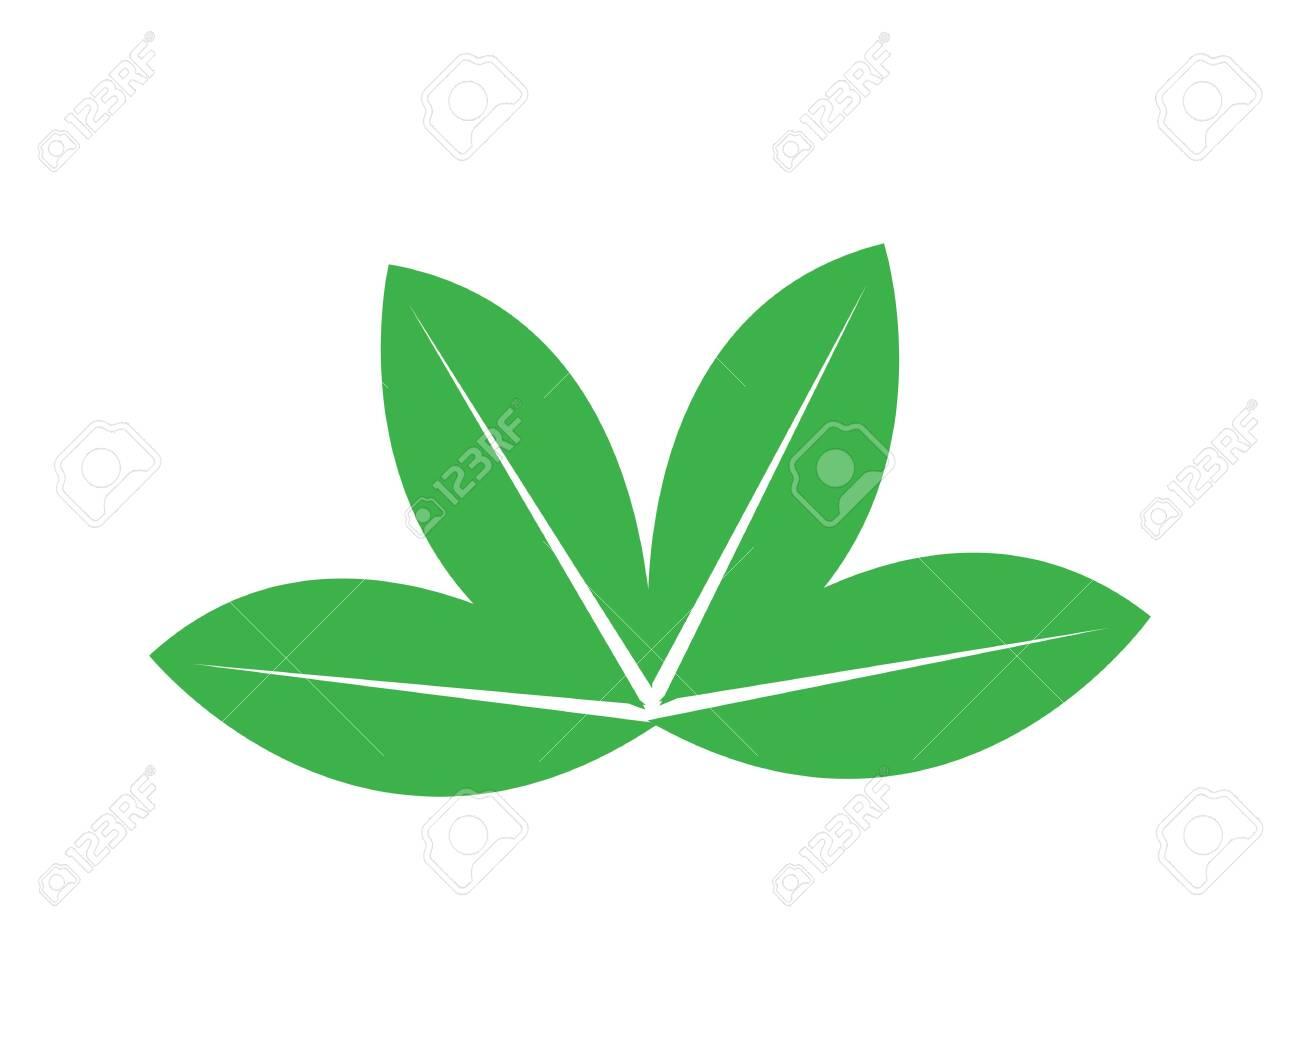 green leaf logo vector - 136601968